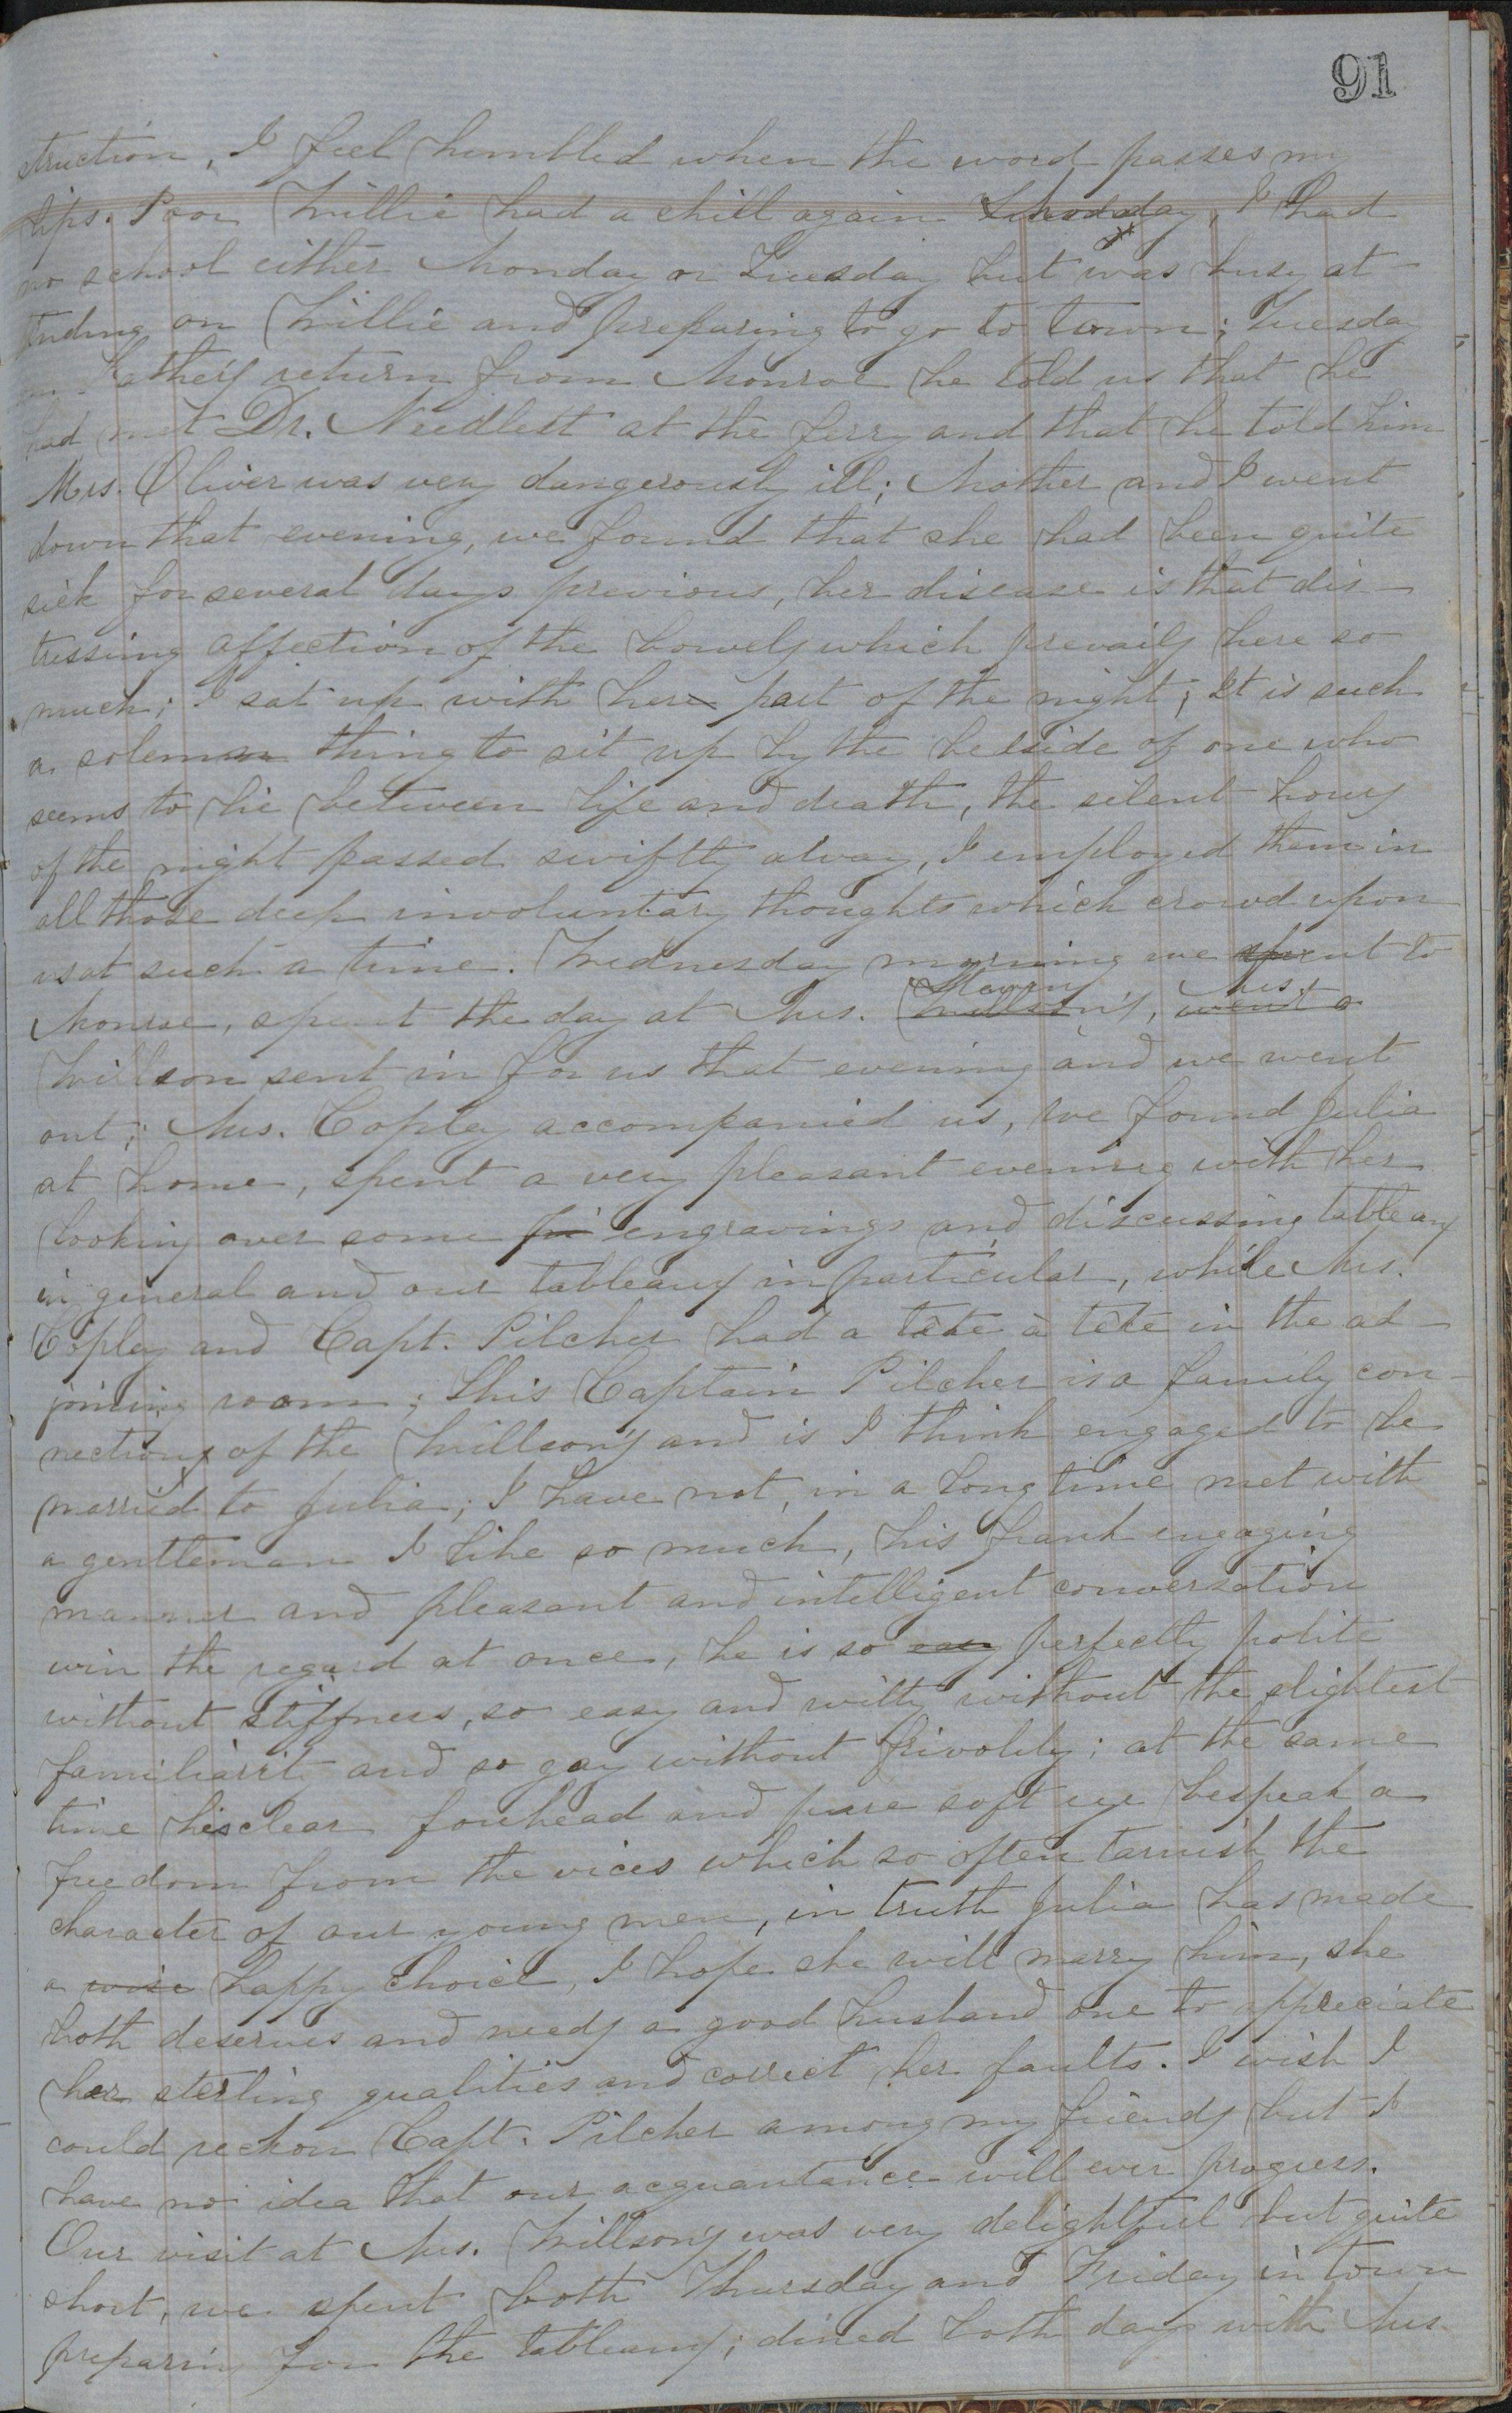 18641027_02